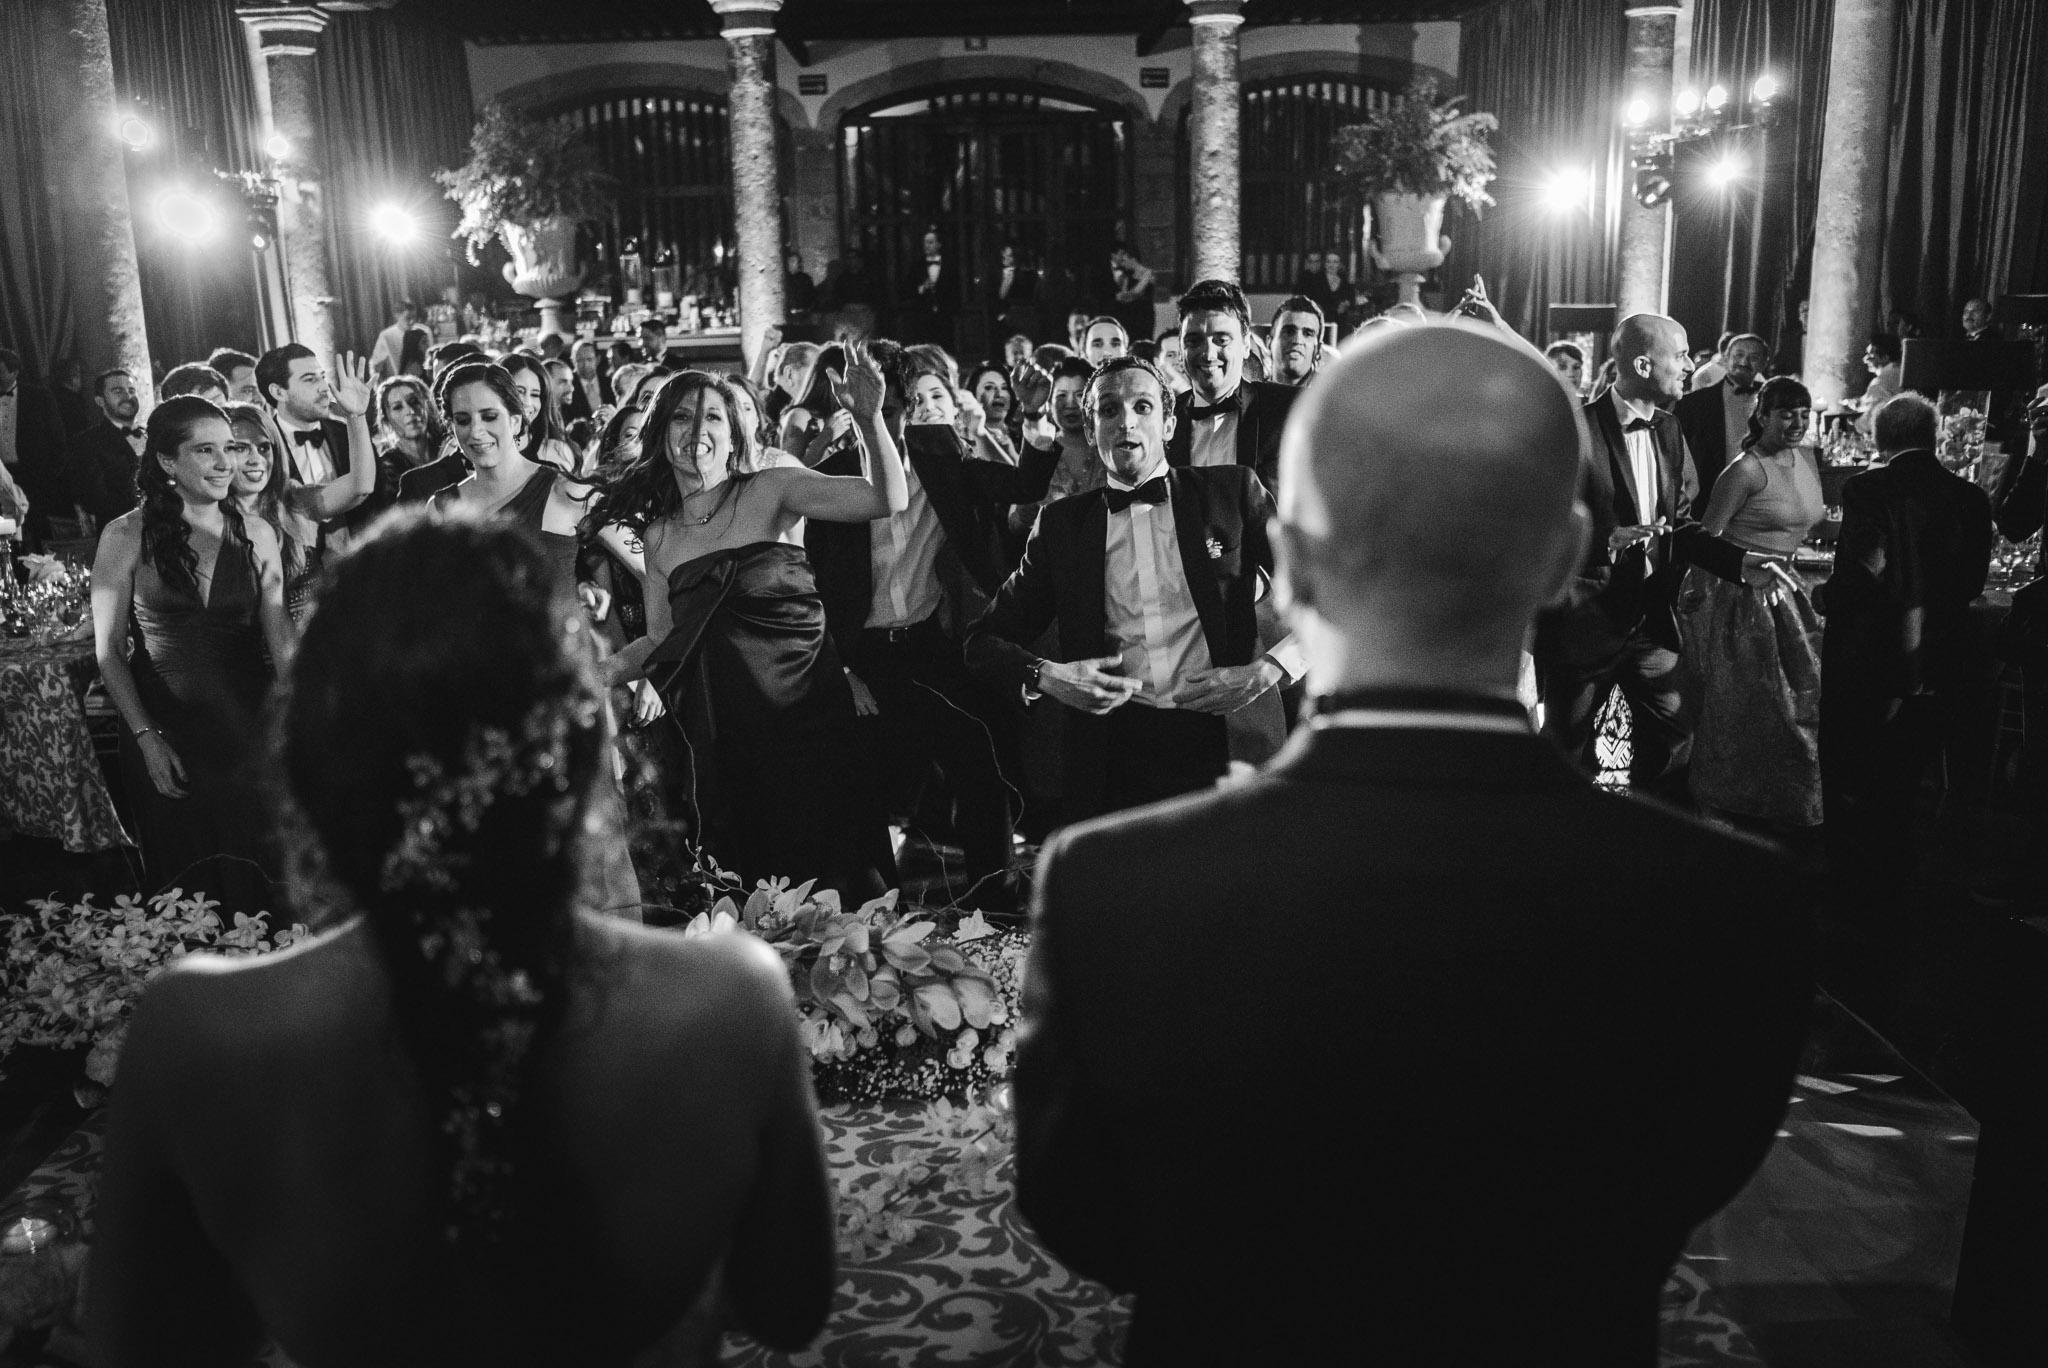 ©www.mauriziosolisbroca.com-20161002maurizio-solis-broca-mexico-canada-wedding-photographer20161002DSC05603-Edit.jpg